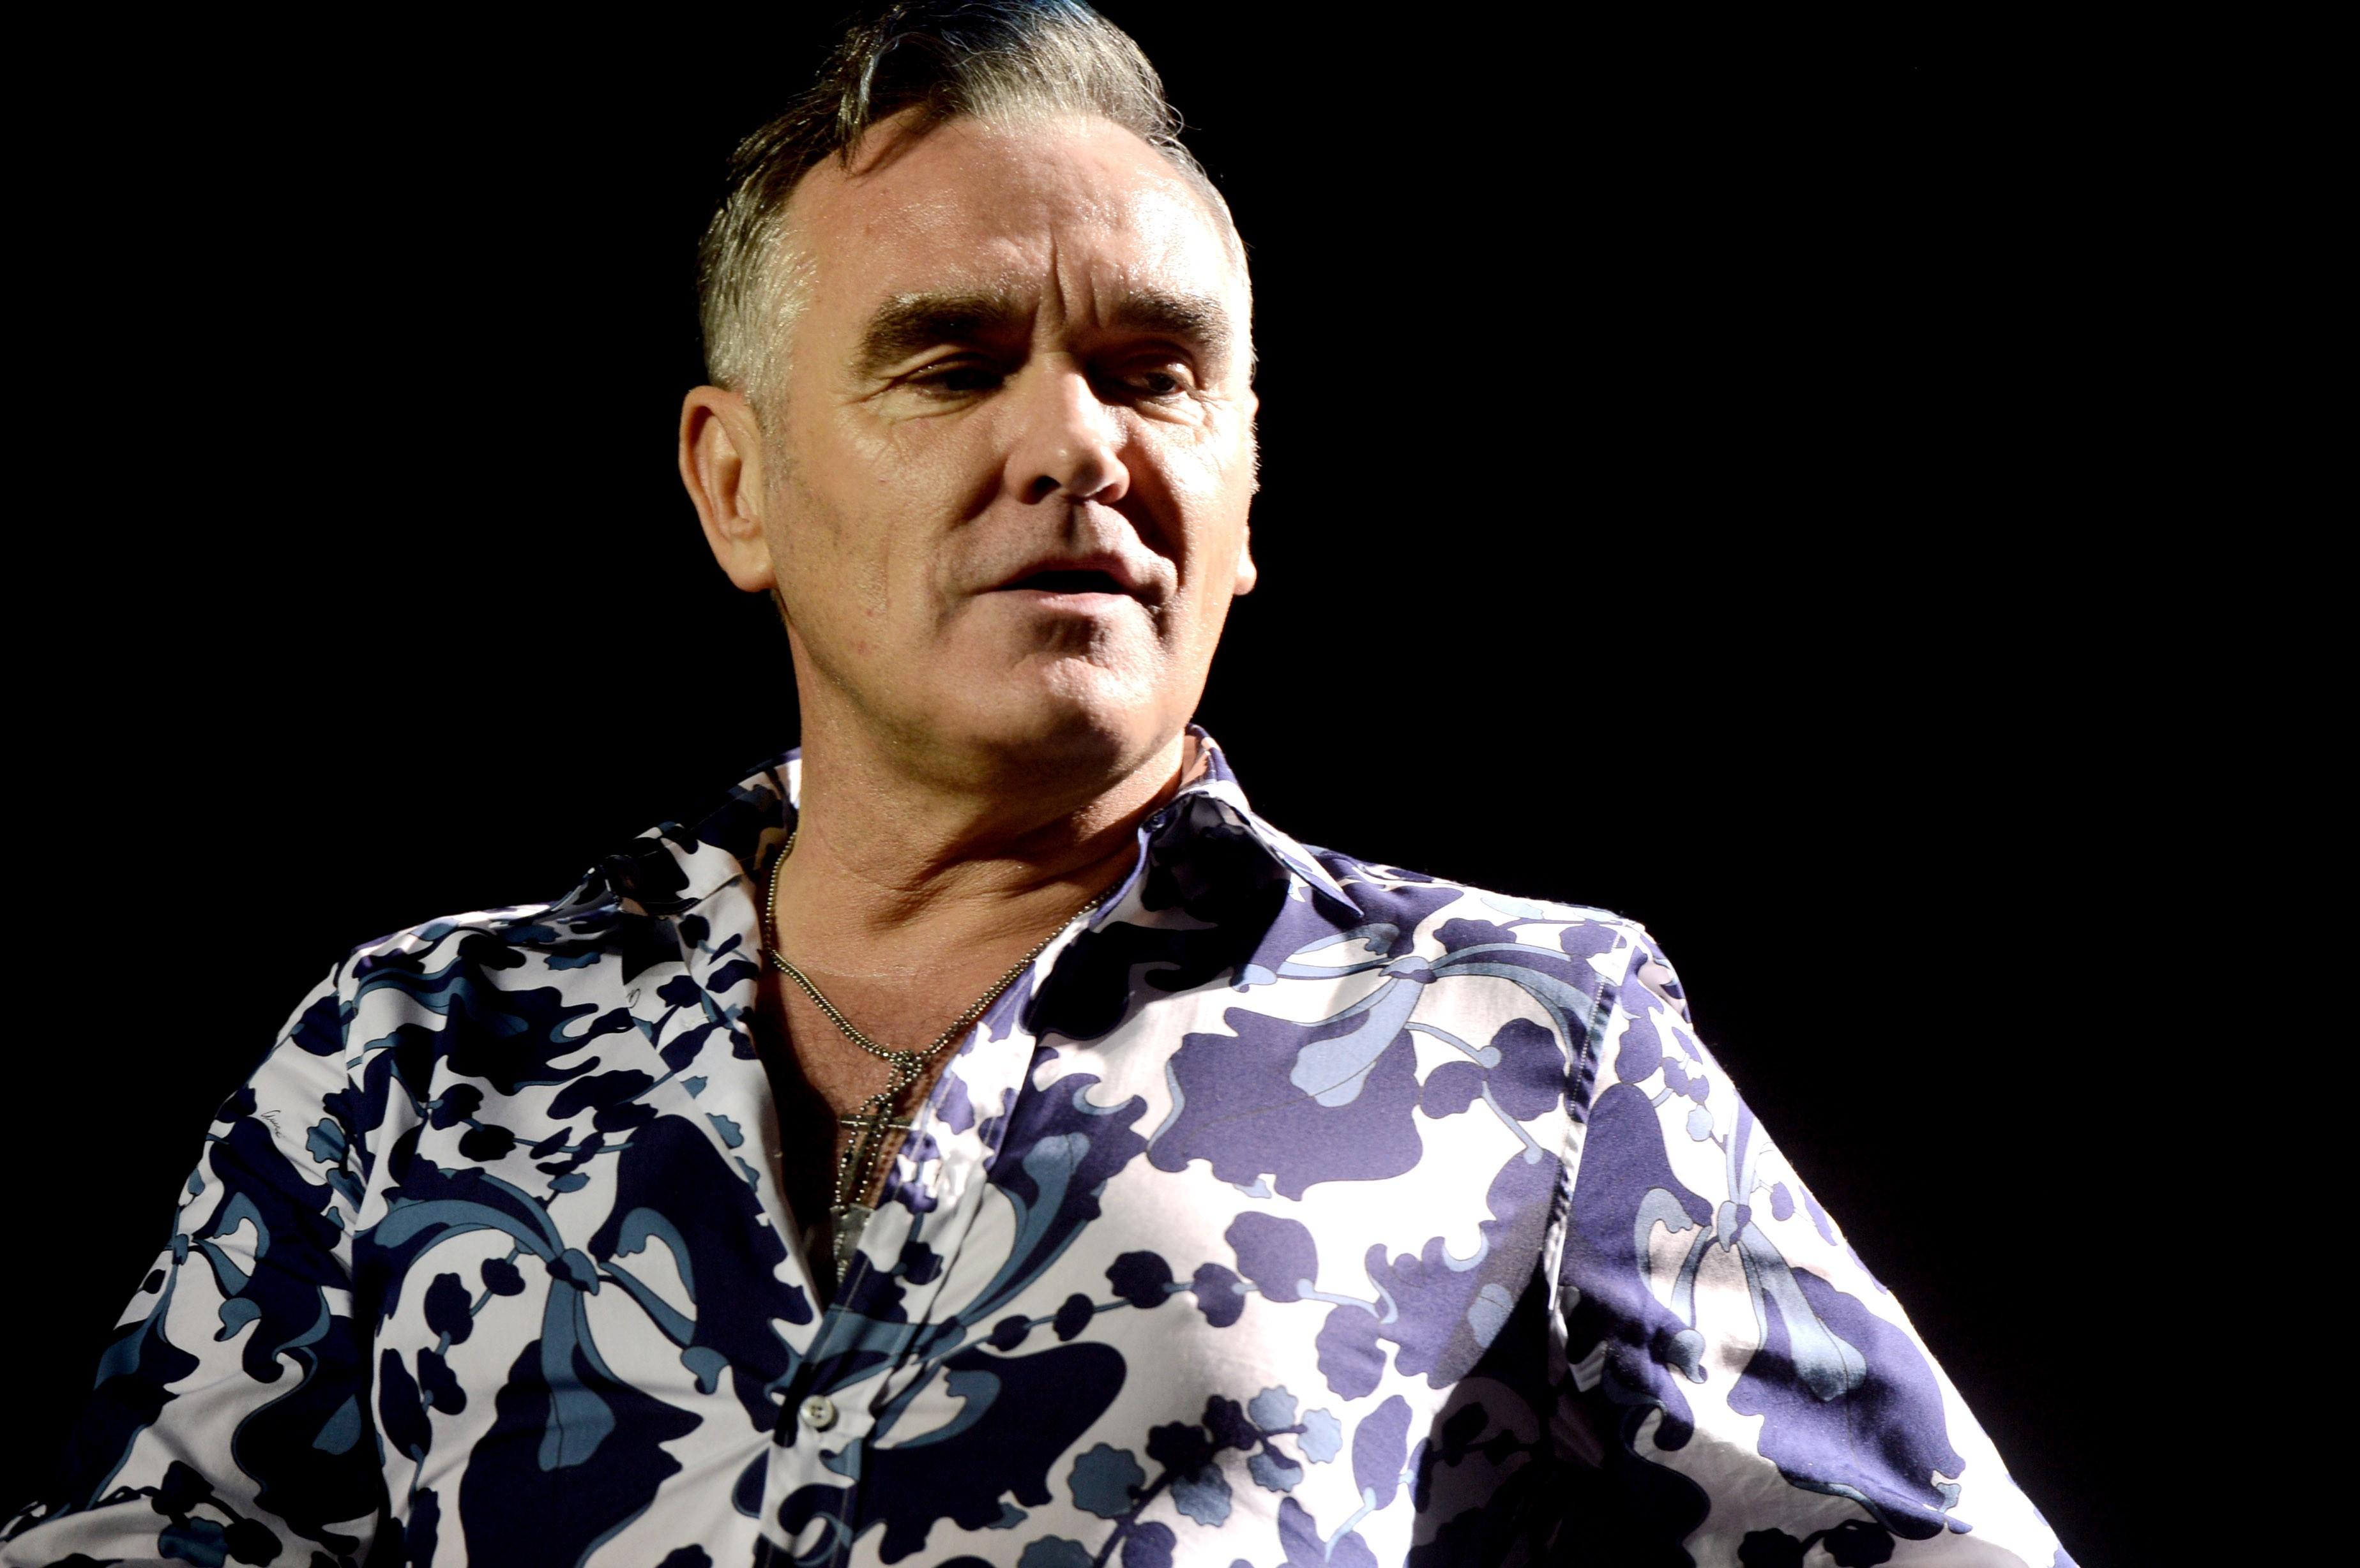 50 Best Morrissey Songs